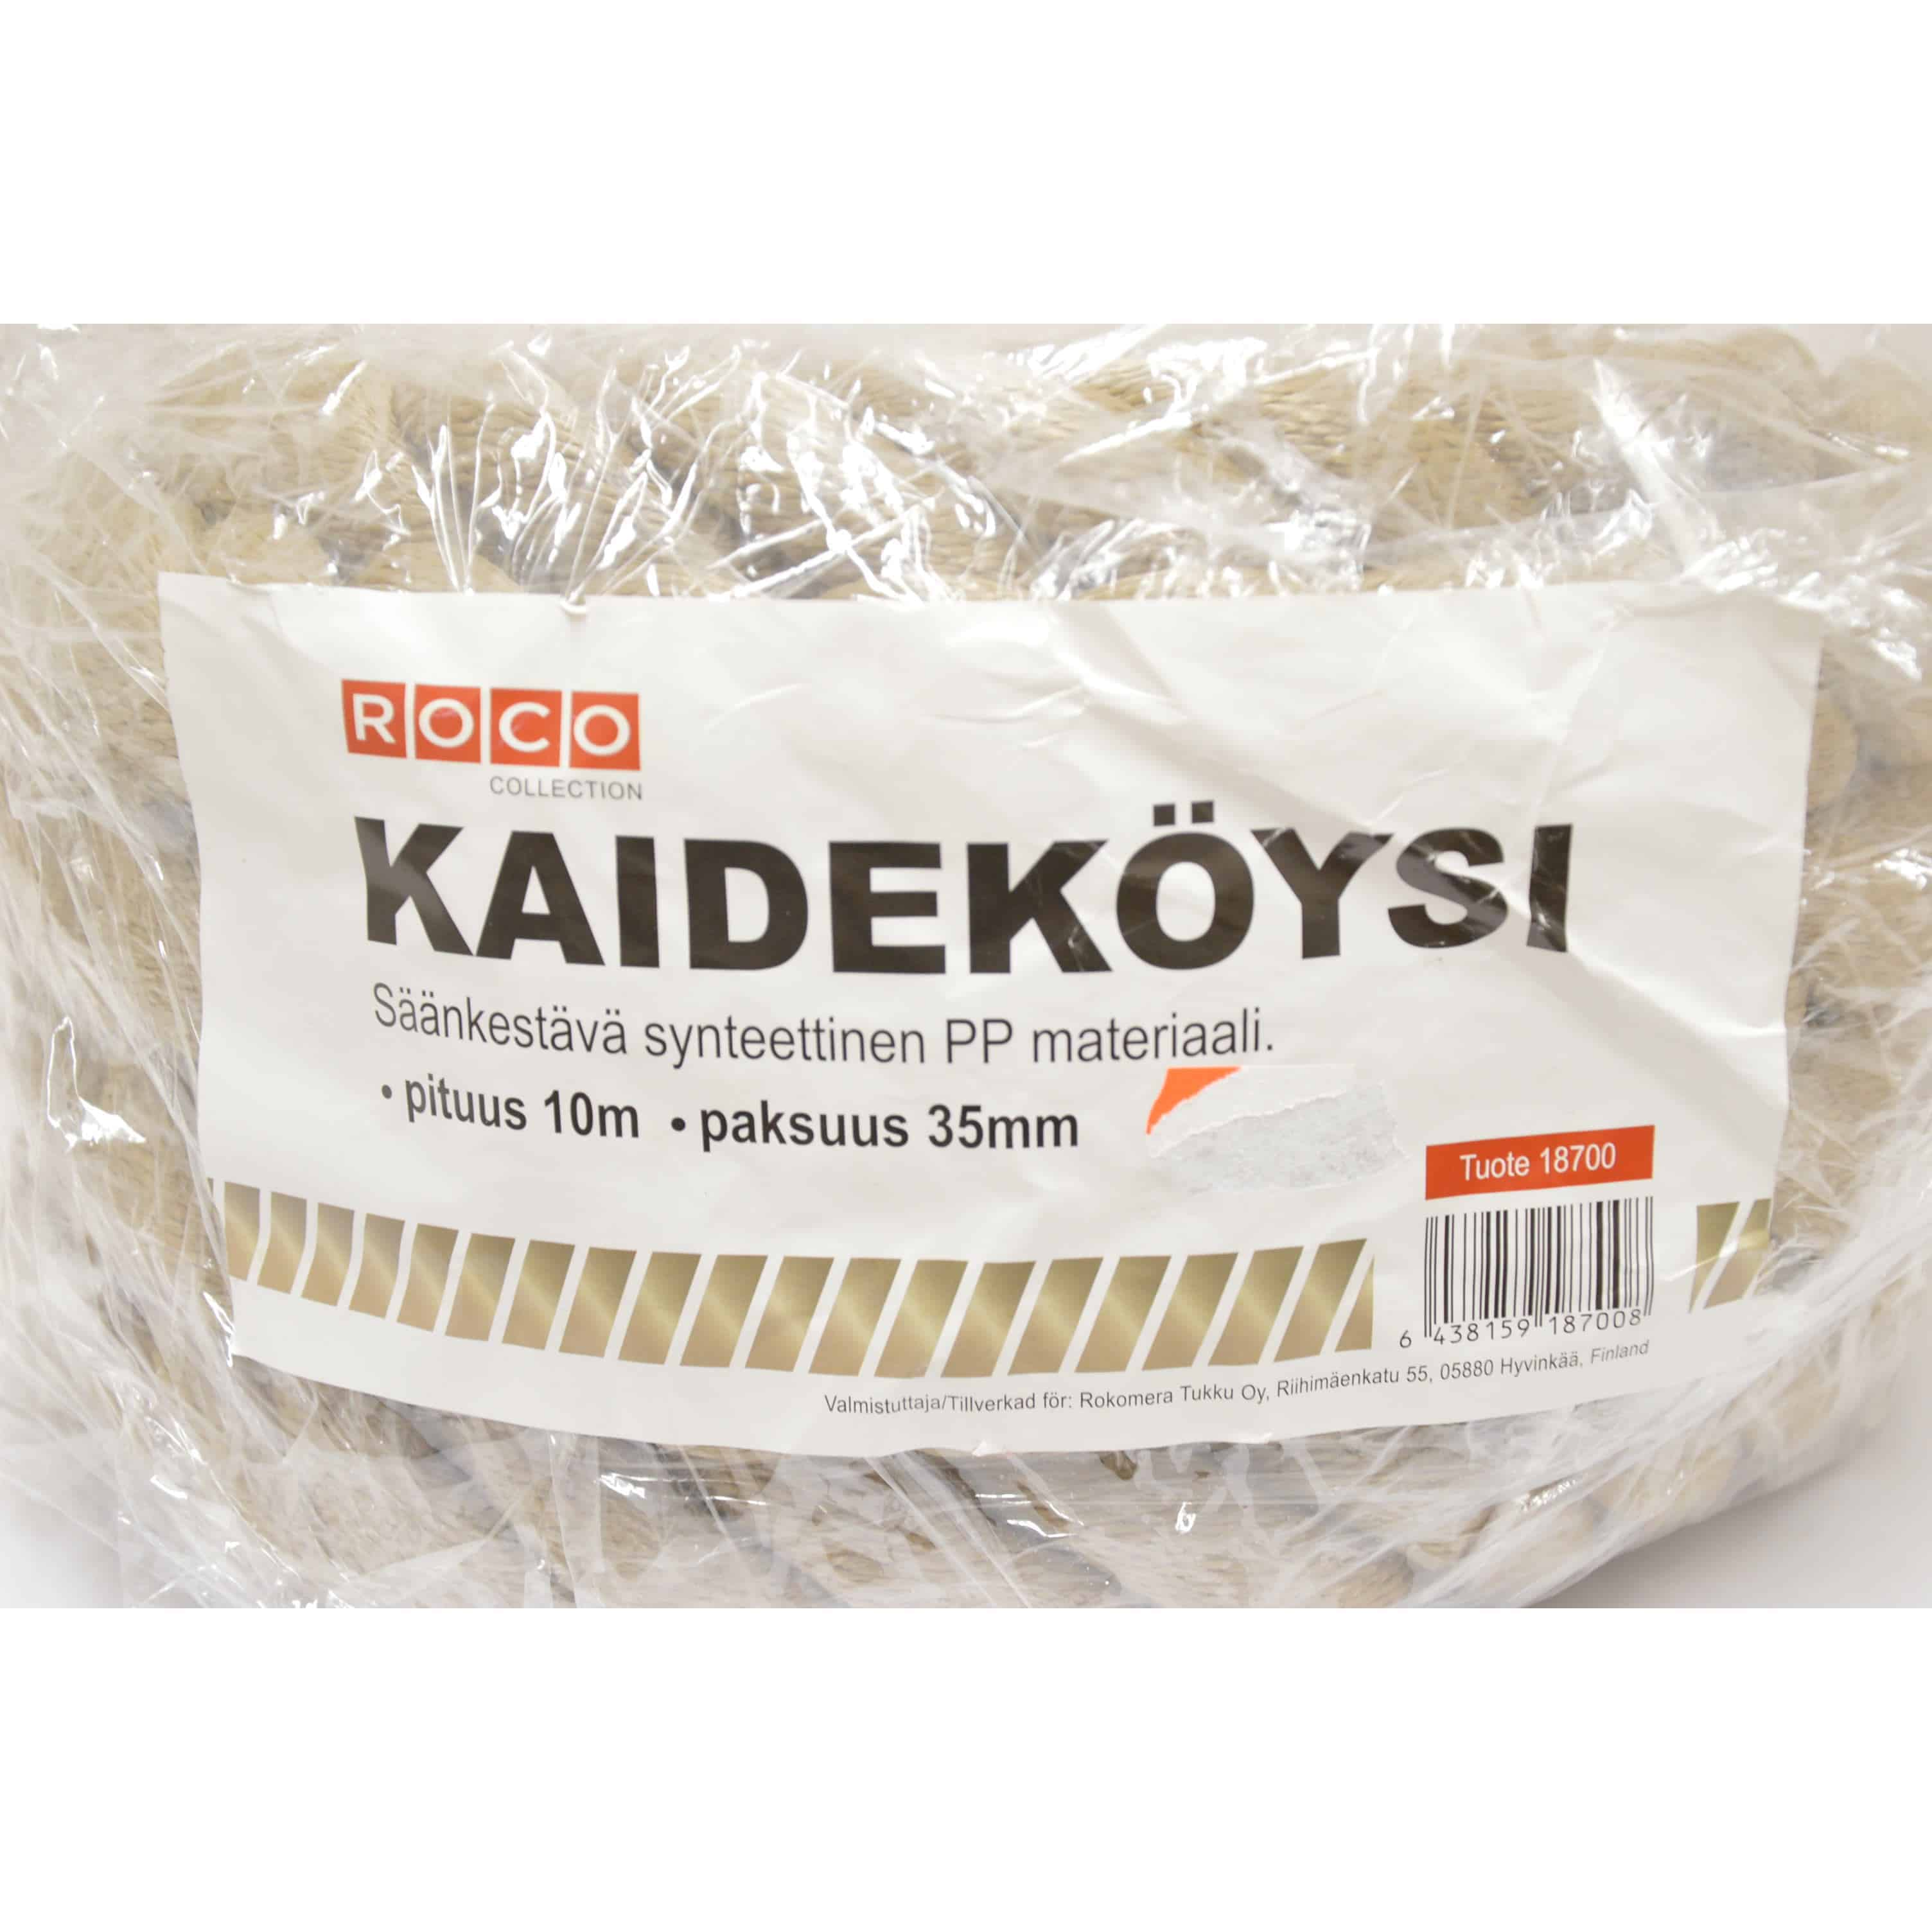 ROCO KAIDEKÖYSI 35MM 10M